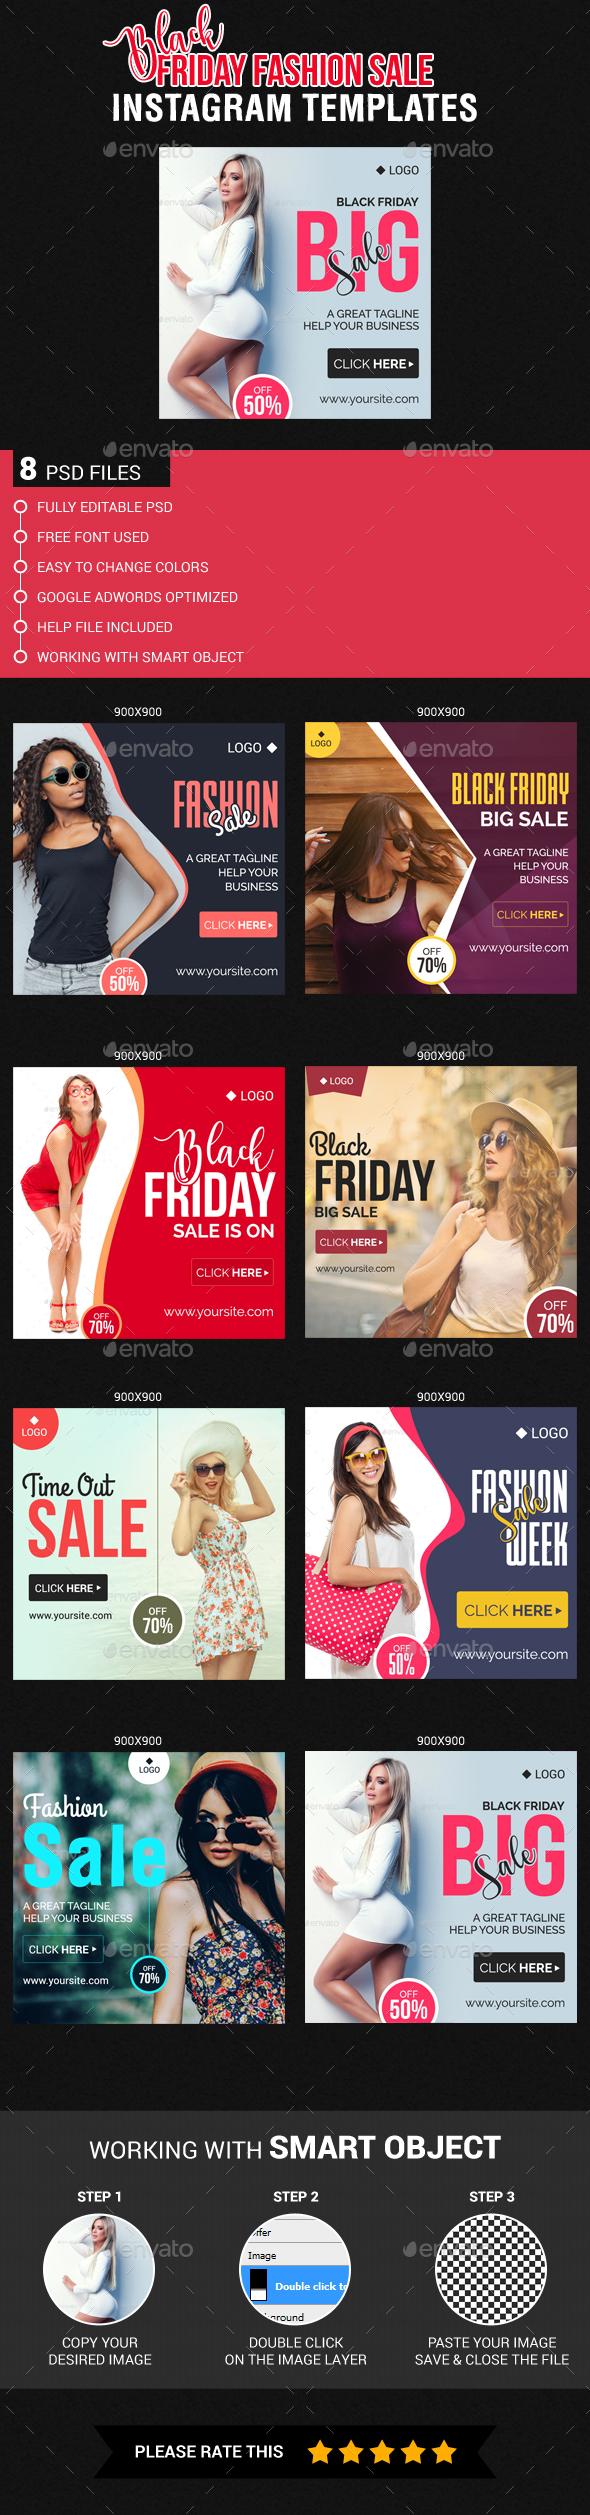 Black Friday Fashion Sale Instagram Templates